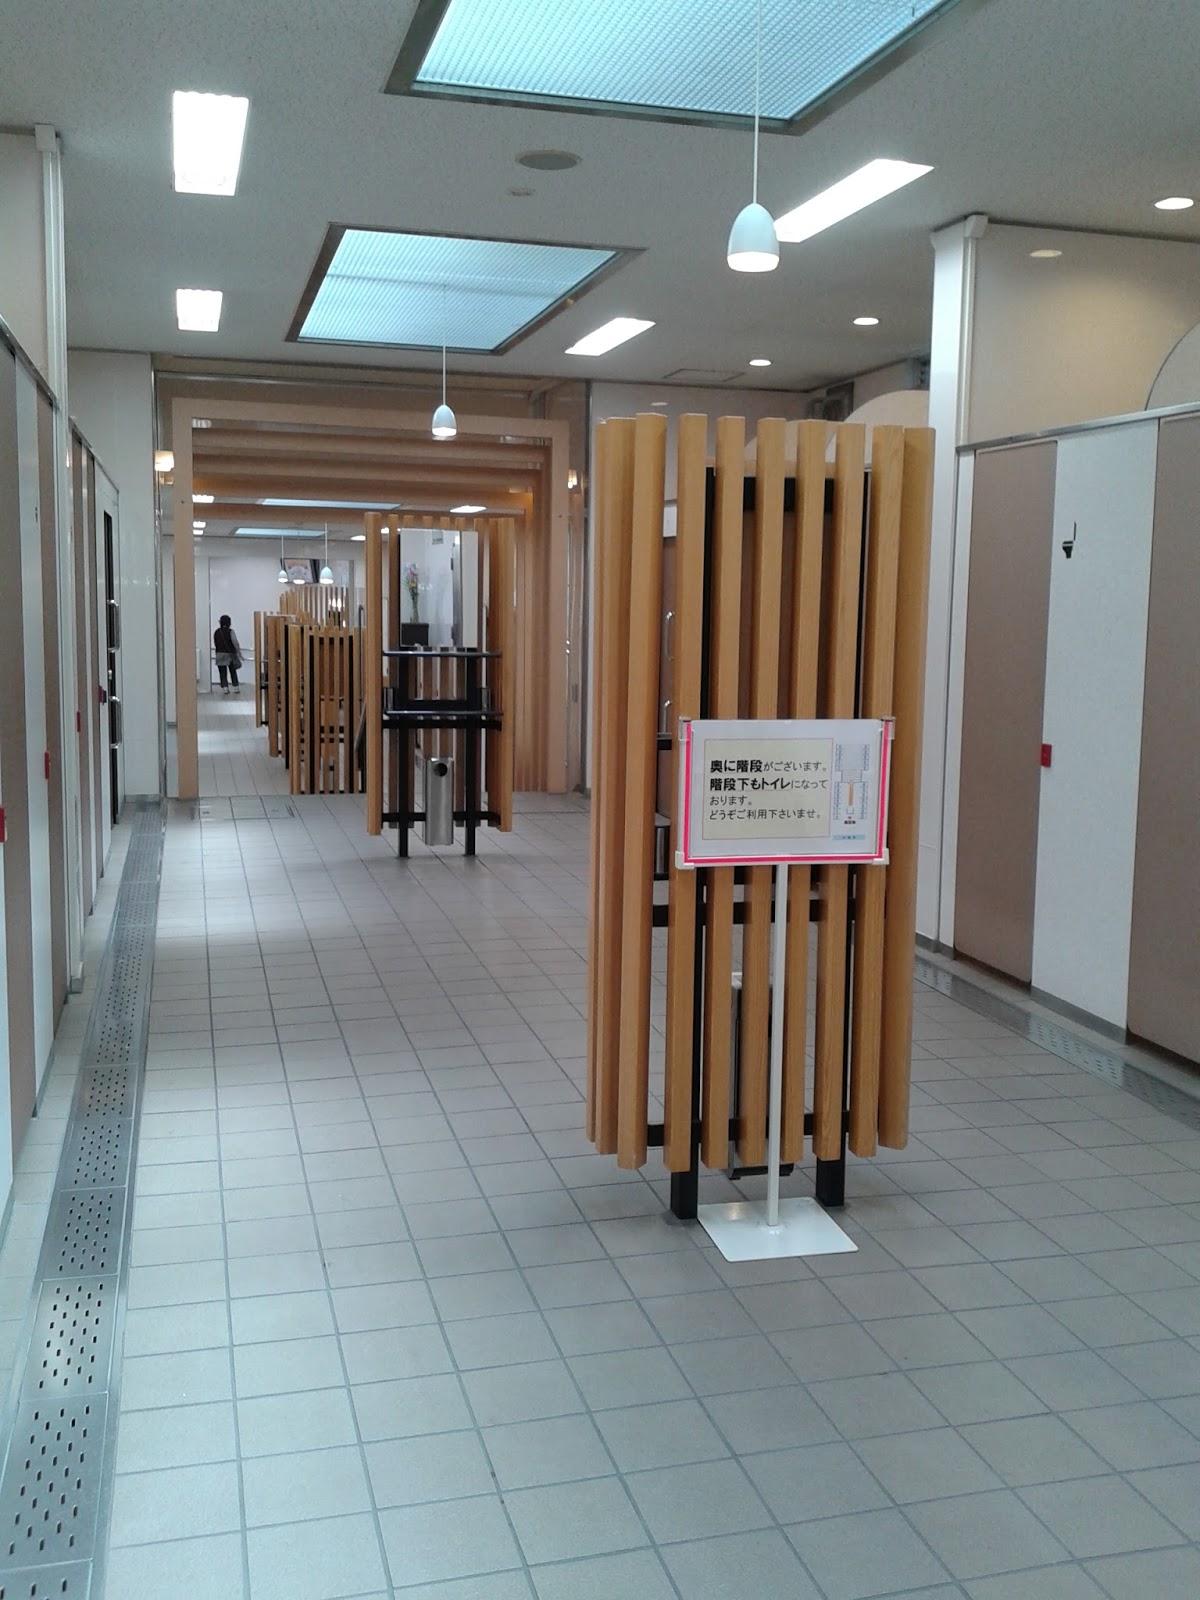 gotemba muslim List of vegetarian restaurants in shizuoka japan, list of halal restaurants in shizuoka japan, muslim friendly restaurants in shizuoka japan.